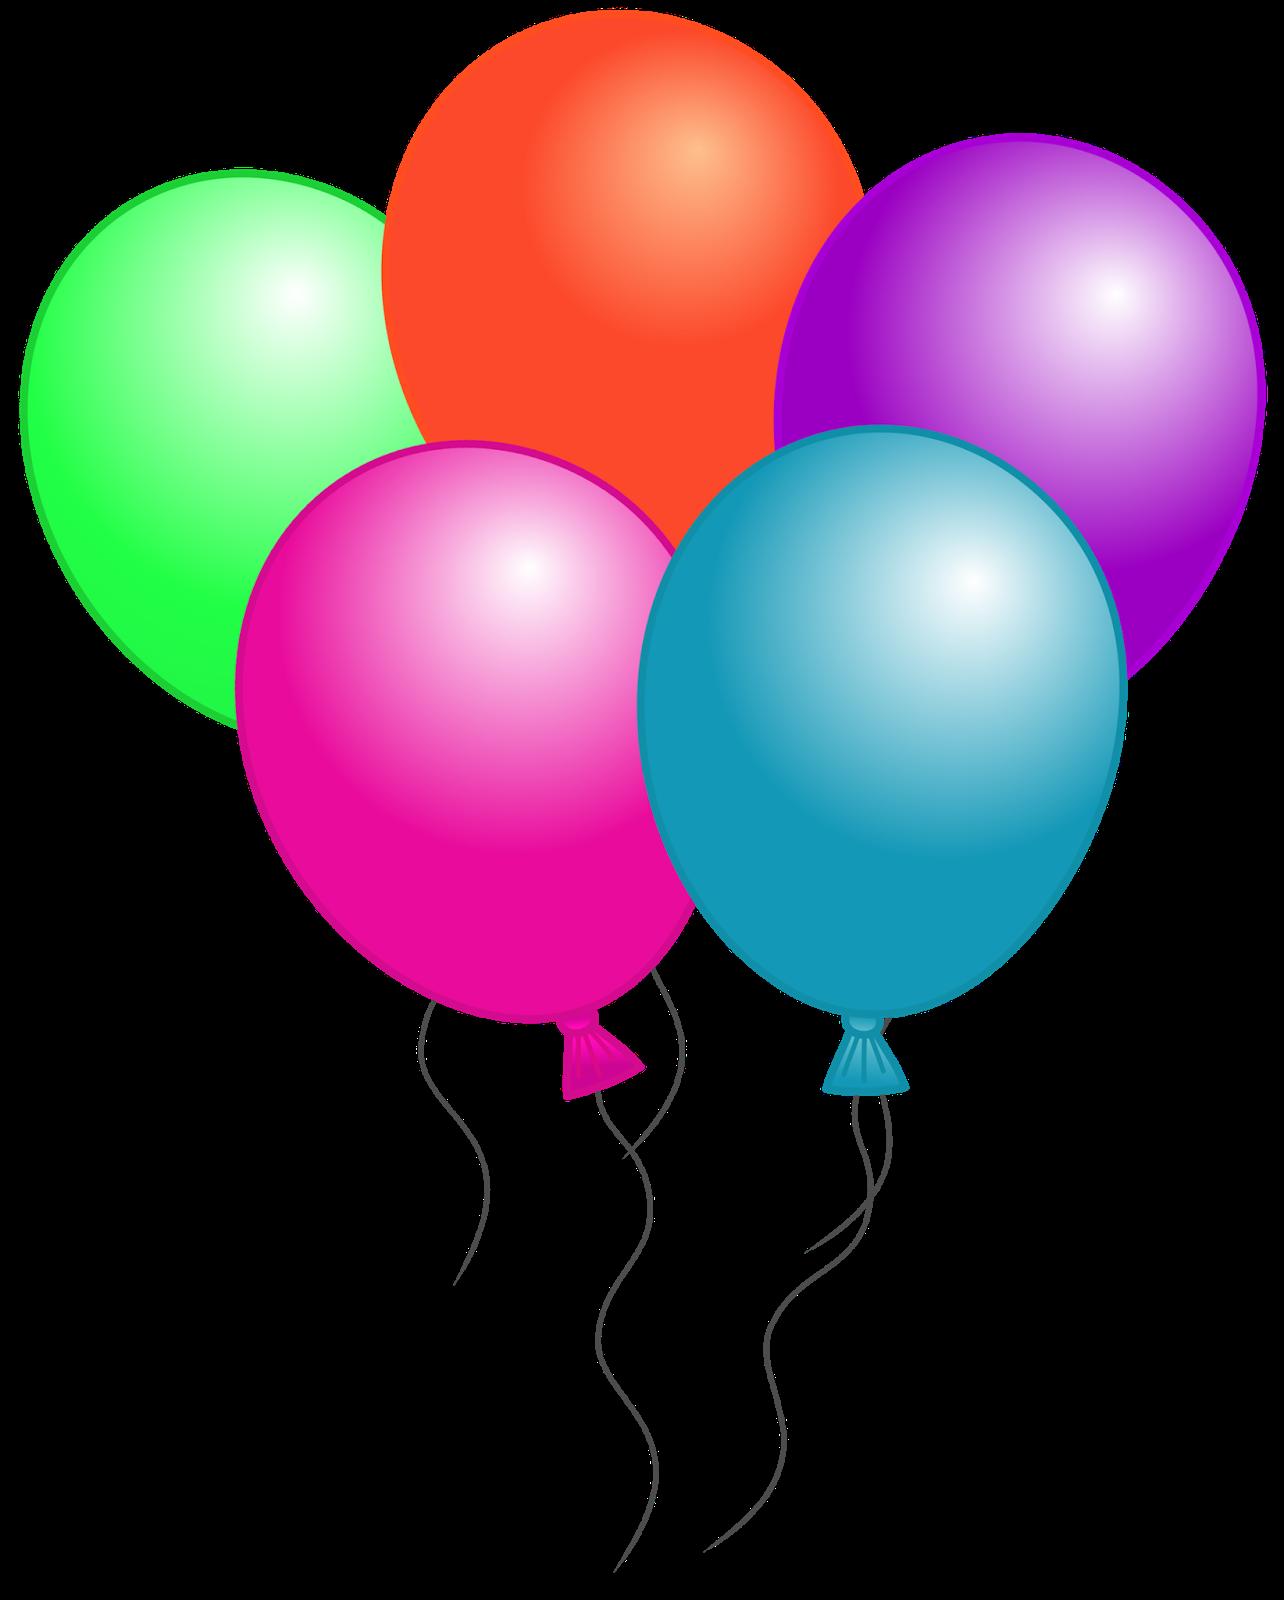 1284x1600 Birthday Balloons Free Birthday Balloon Clip Art Clipart Images 5